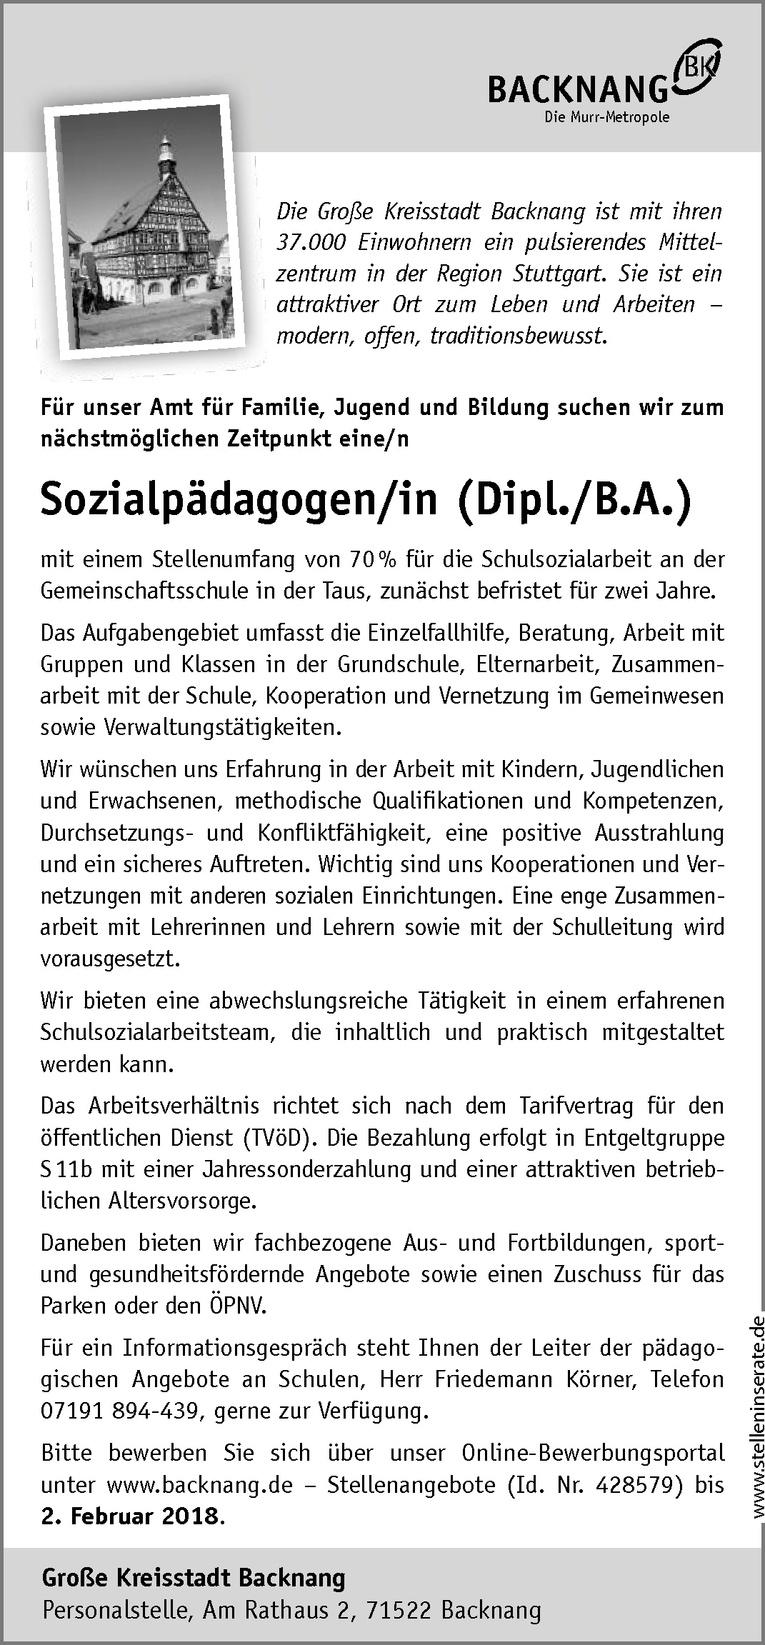 Sozialpädagogen/in (Dipl./B.A.)